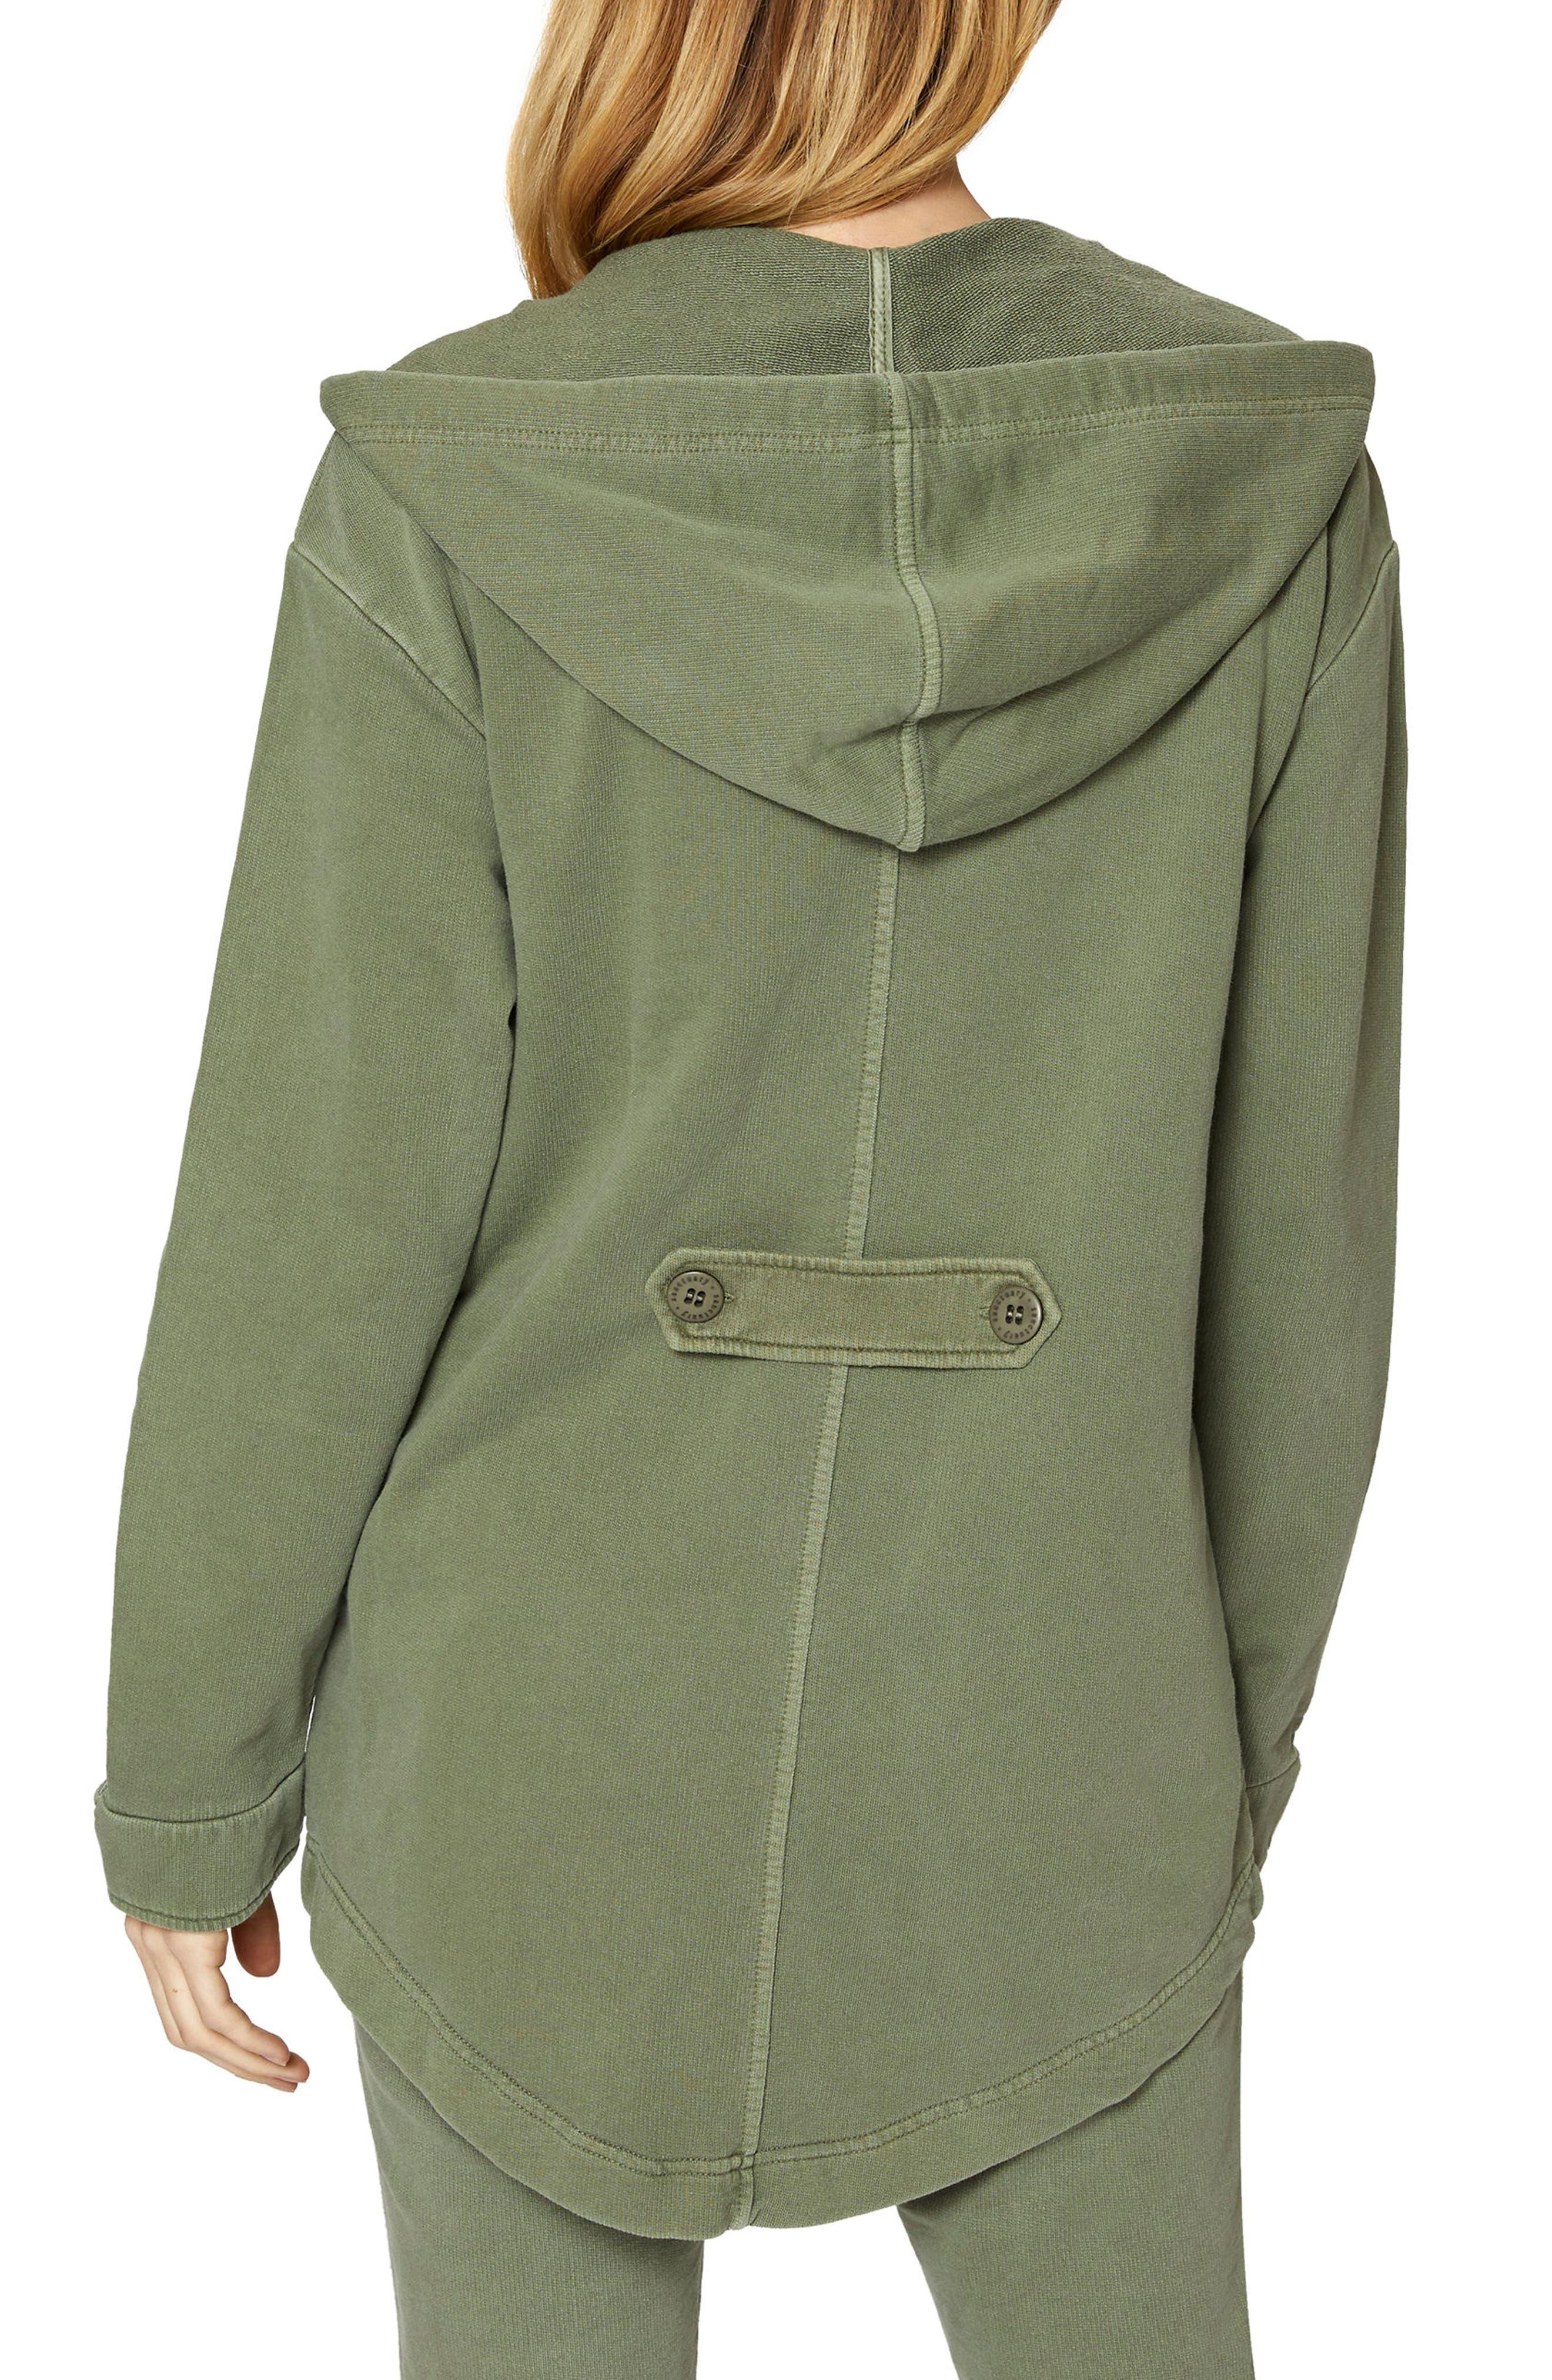 Alternate Image 2  - Sanctuary Top Rank Hooded Jacket